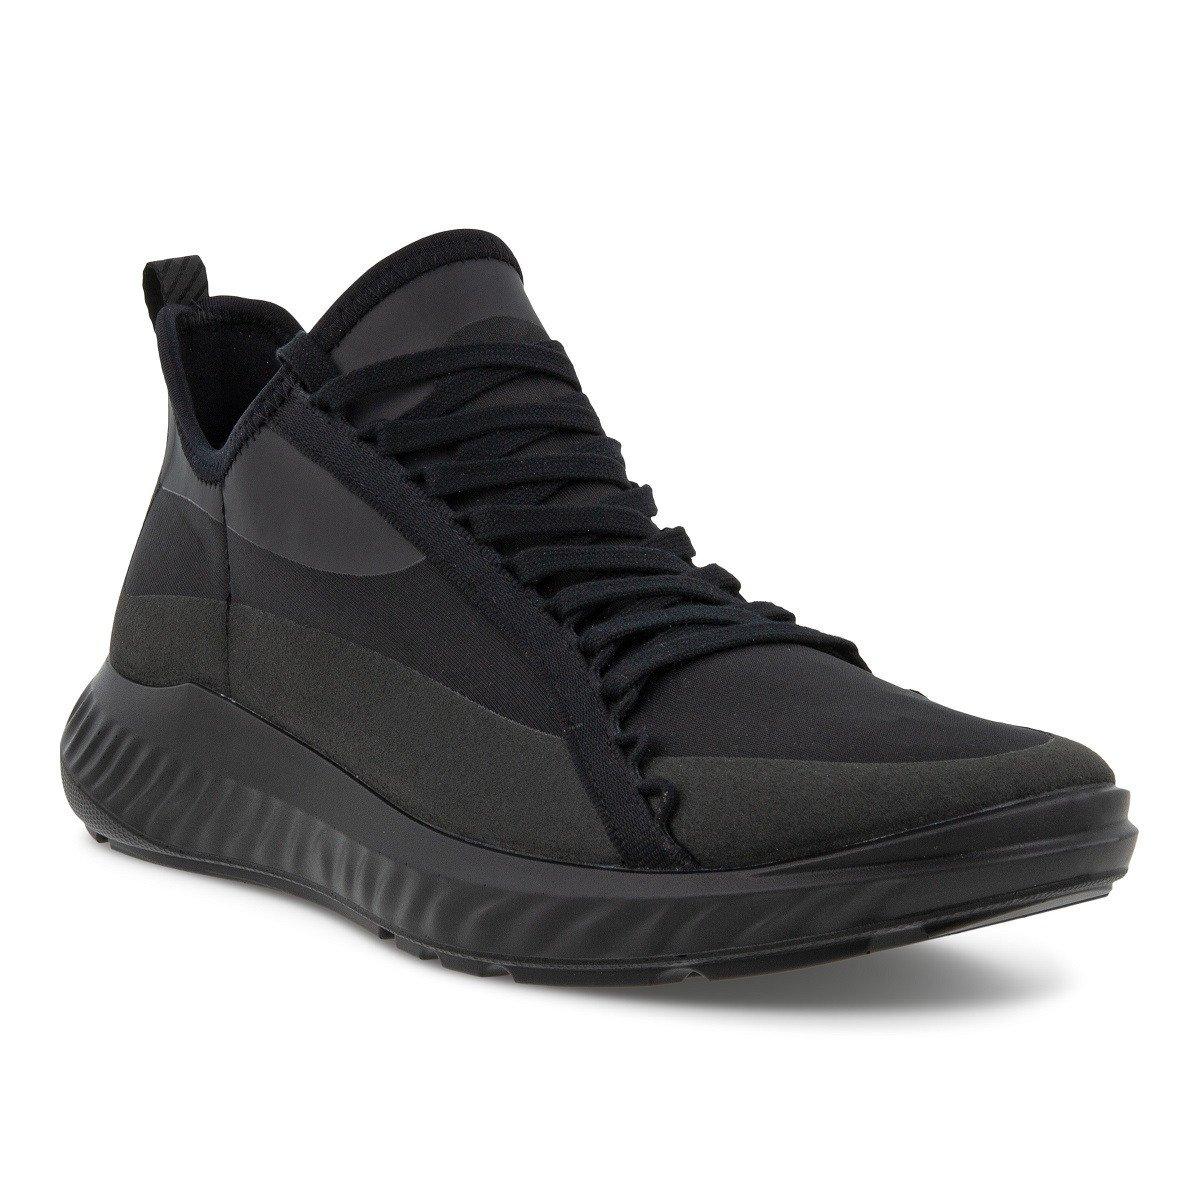 Ecco ATH1 Sneakers Herre